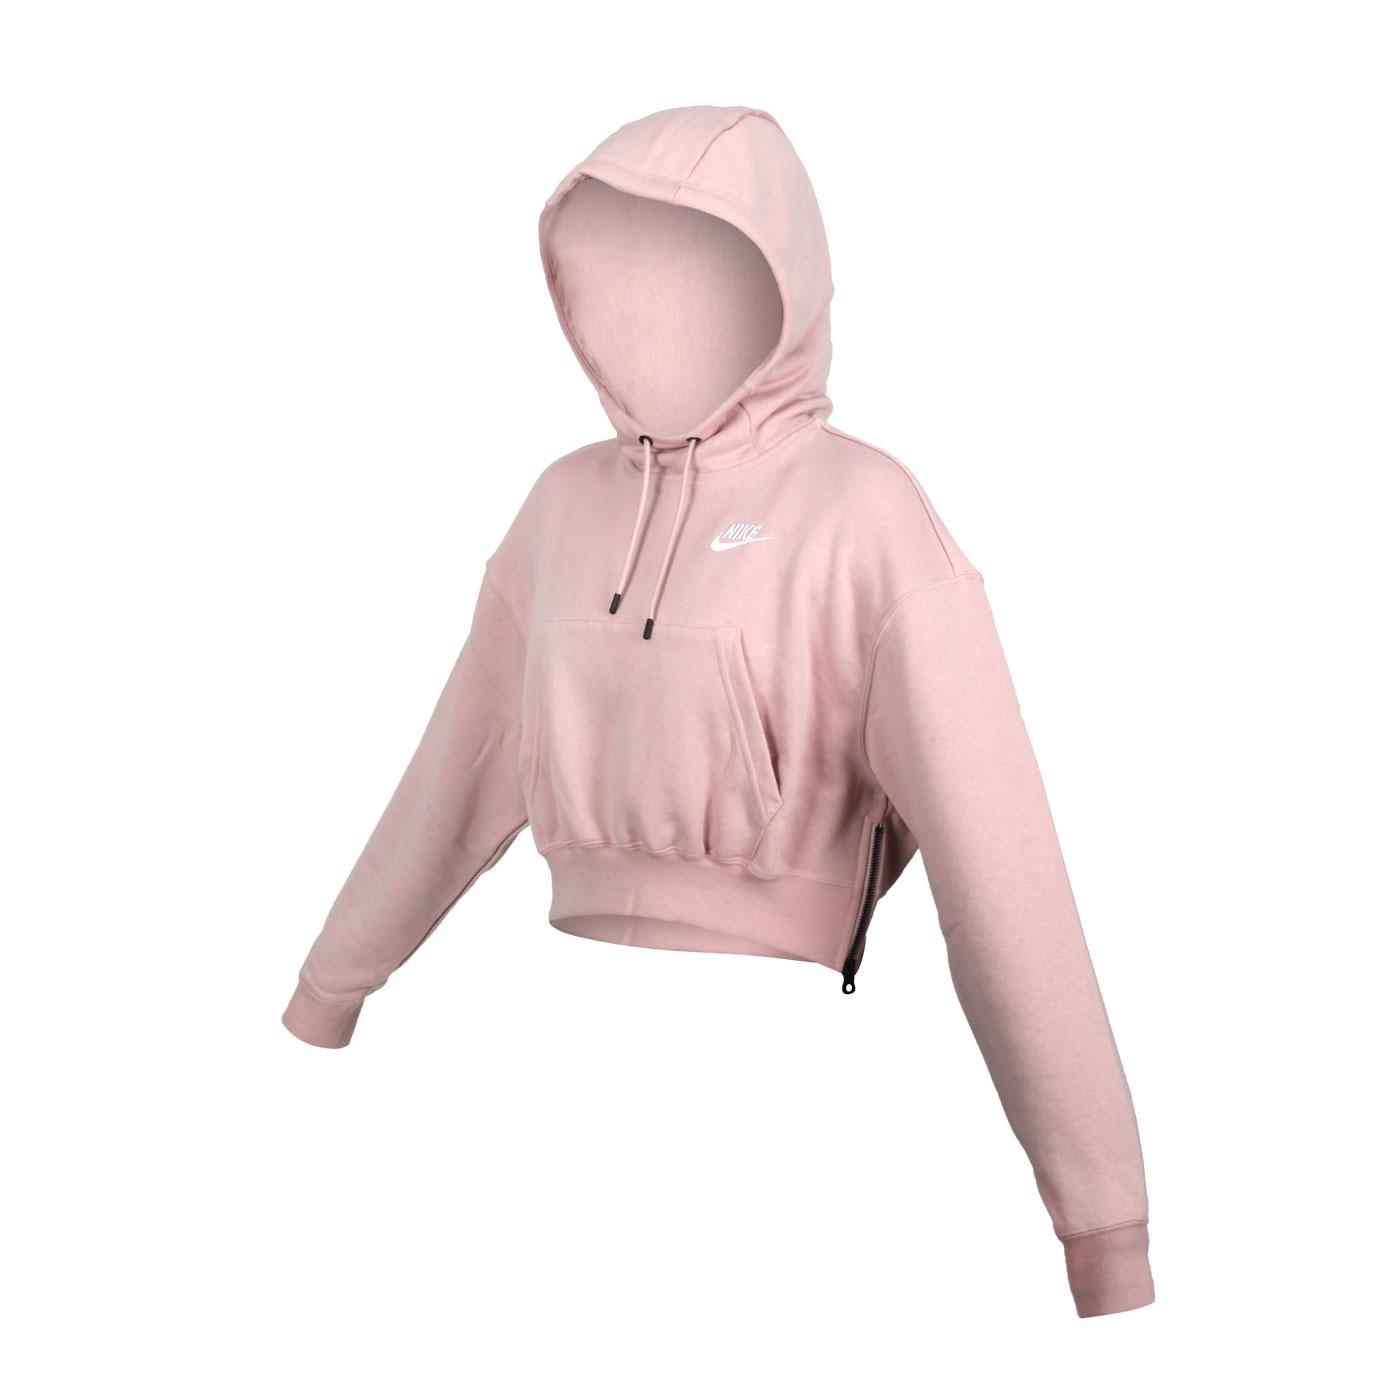 NIKE 女款連帽圓領長袖T恤 DD5382-601 - 粉紅白